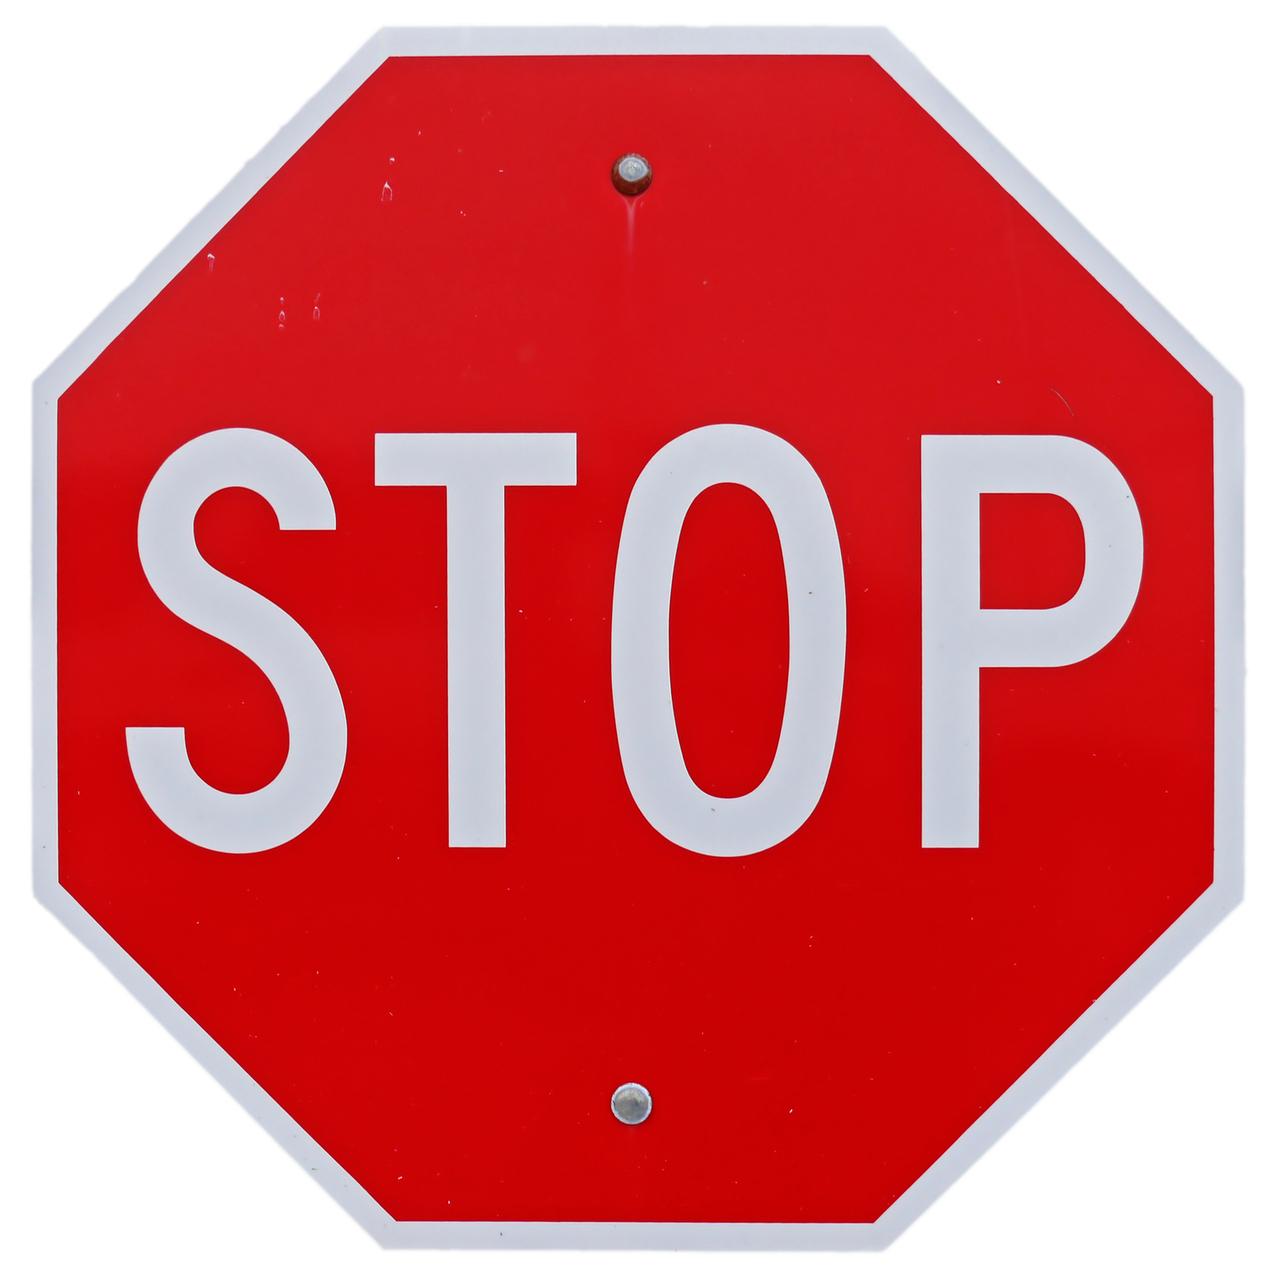 stop-sign-1420987-1279x1279.jpg